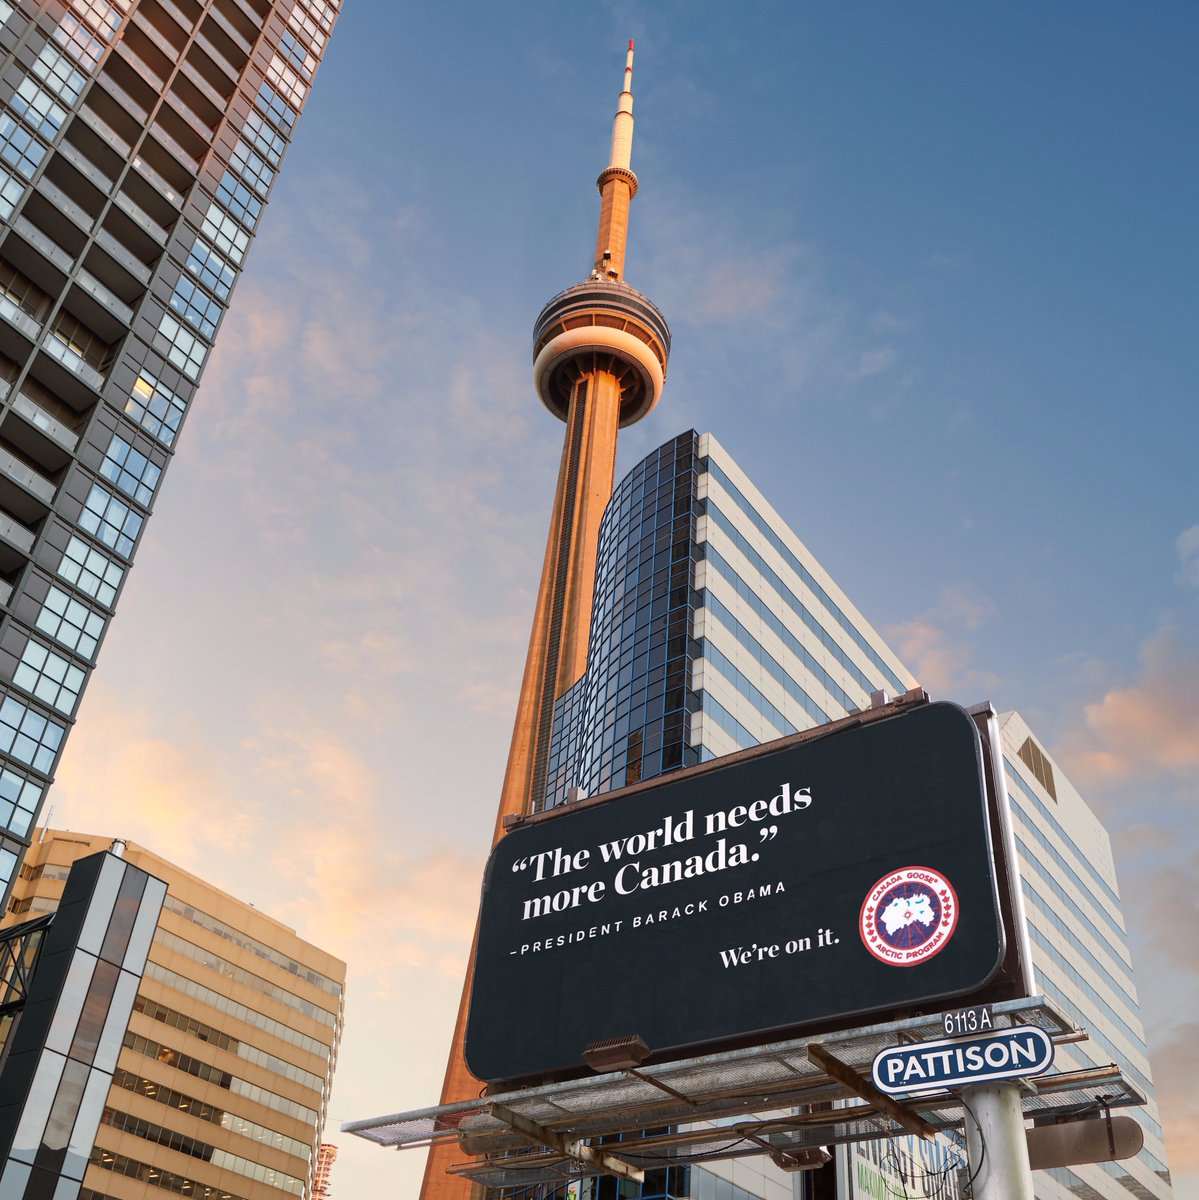 Welcome to Toronto, @BarackObama